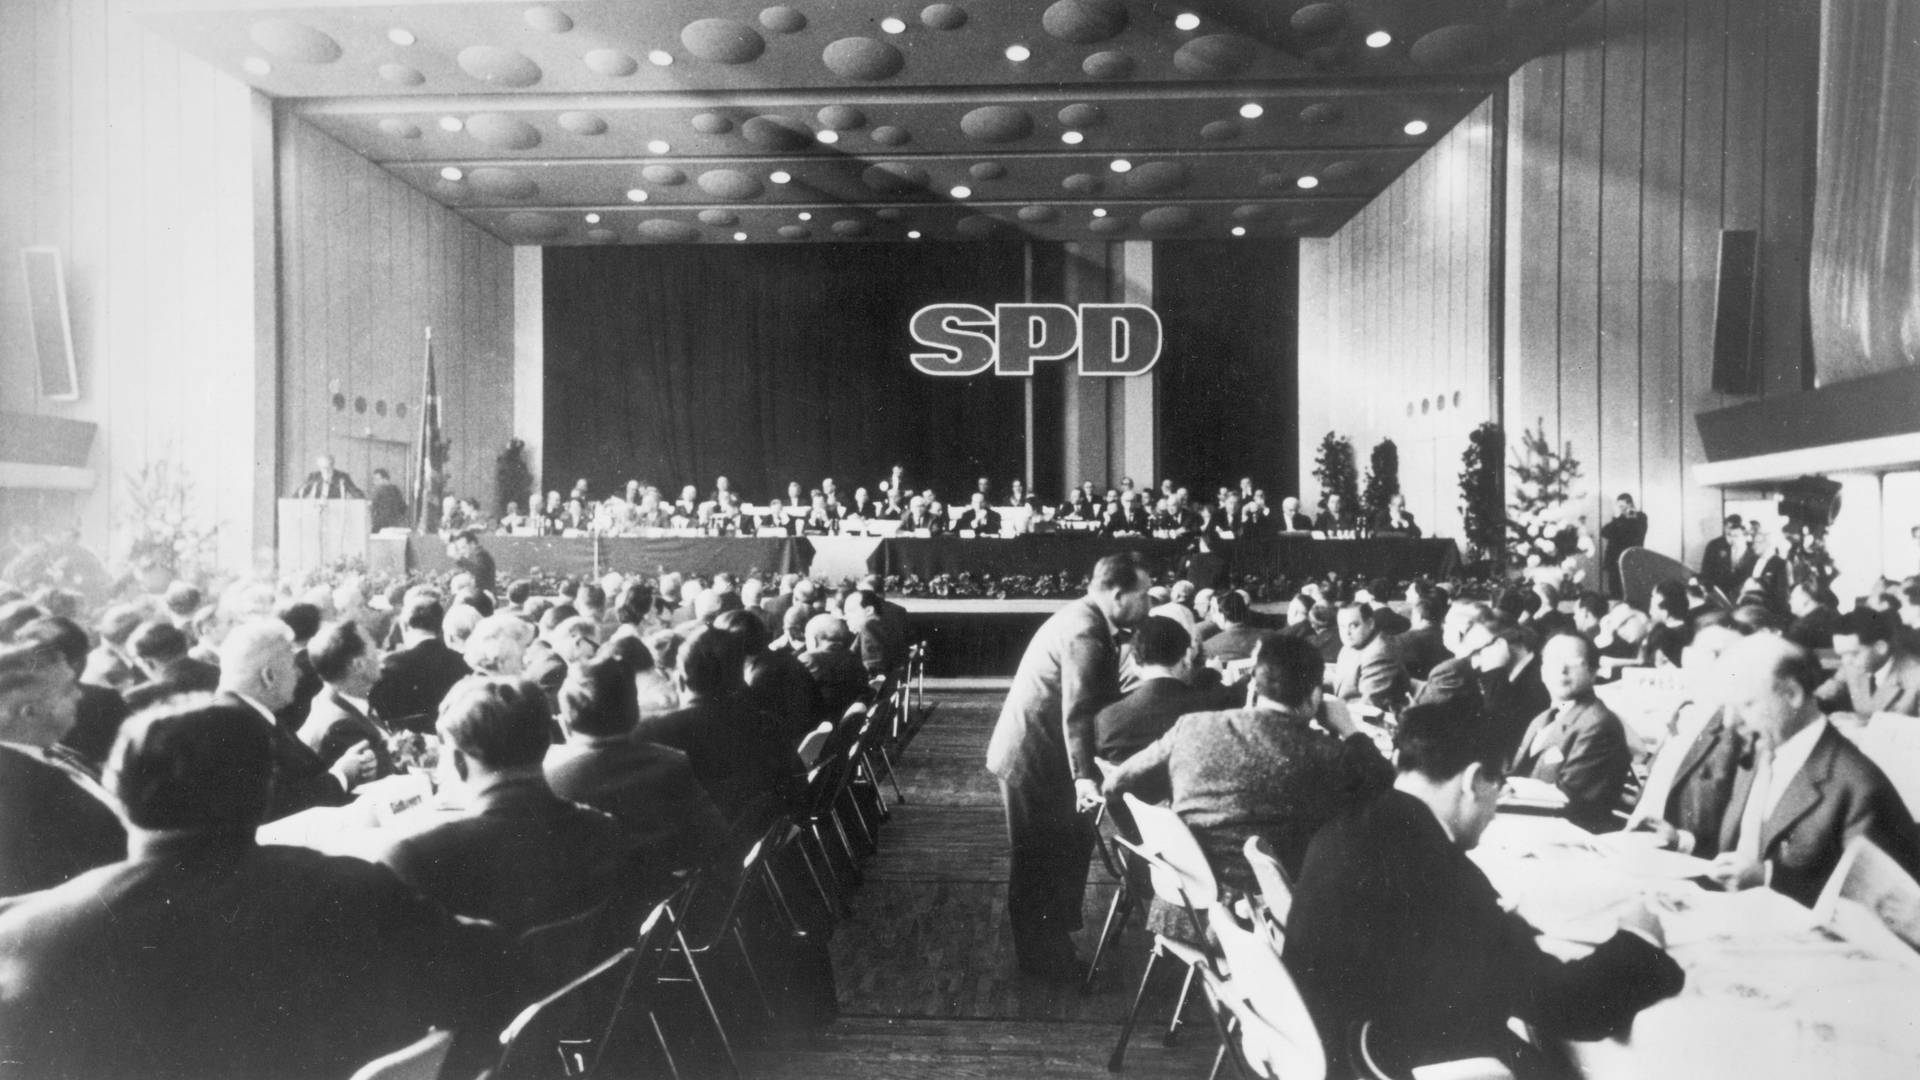 Risultati immagini per 1959 BAD GODESBERG FOTO ?